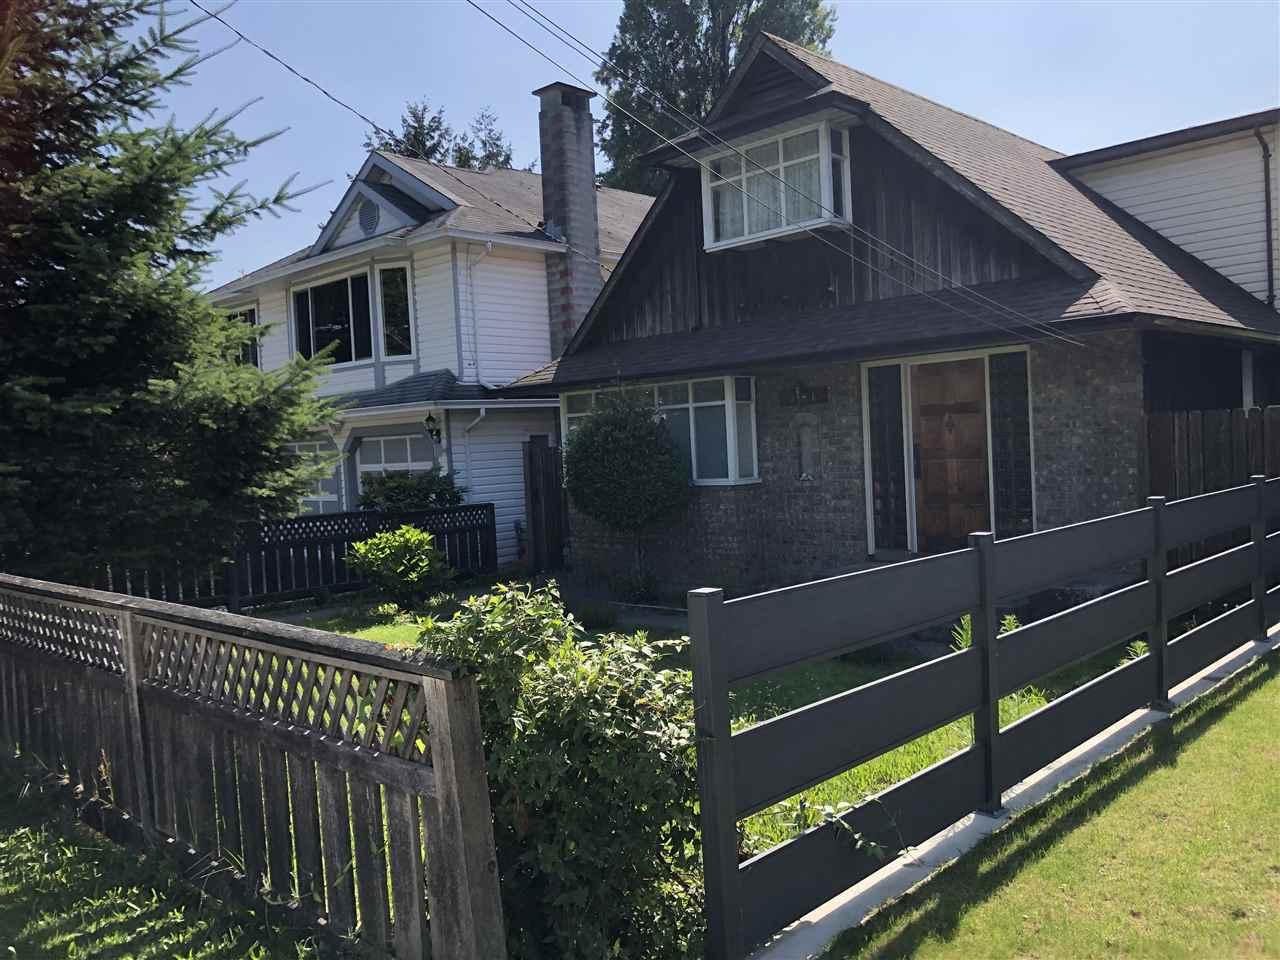 5815 JOYCE STREET - Killarney VE House/Single Family for sale, 3 Bedrooms (R2475235)